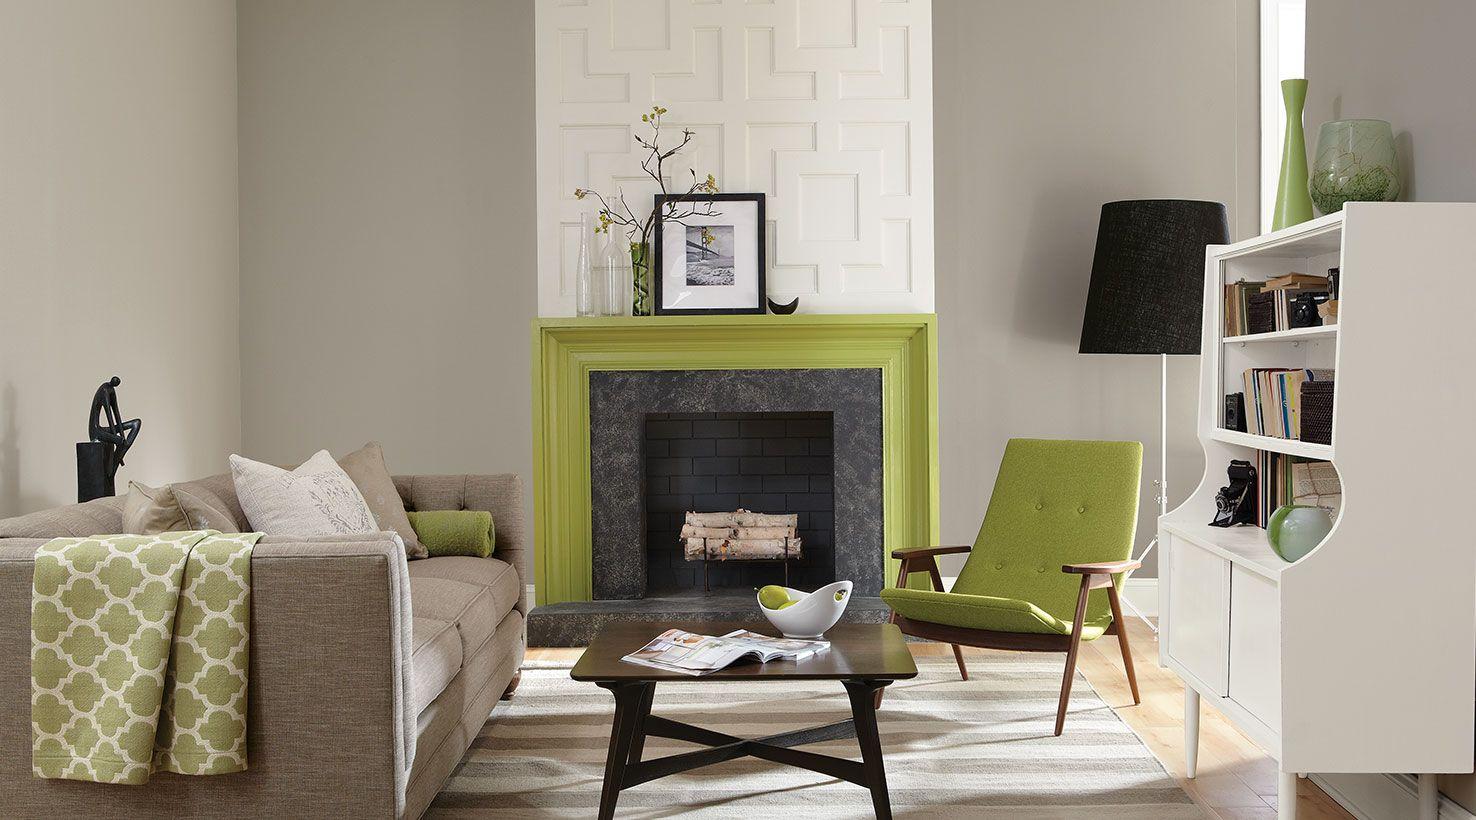 living room paint color ideas inspiration gallery on living room color inspiration id=66124